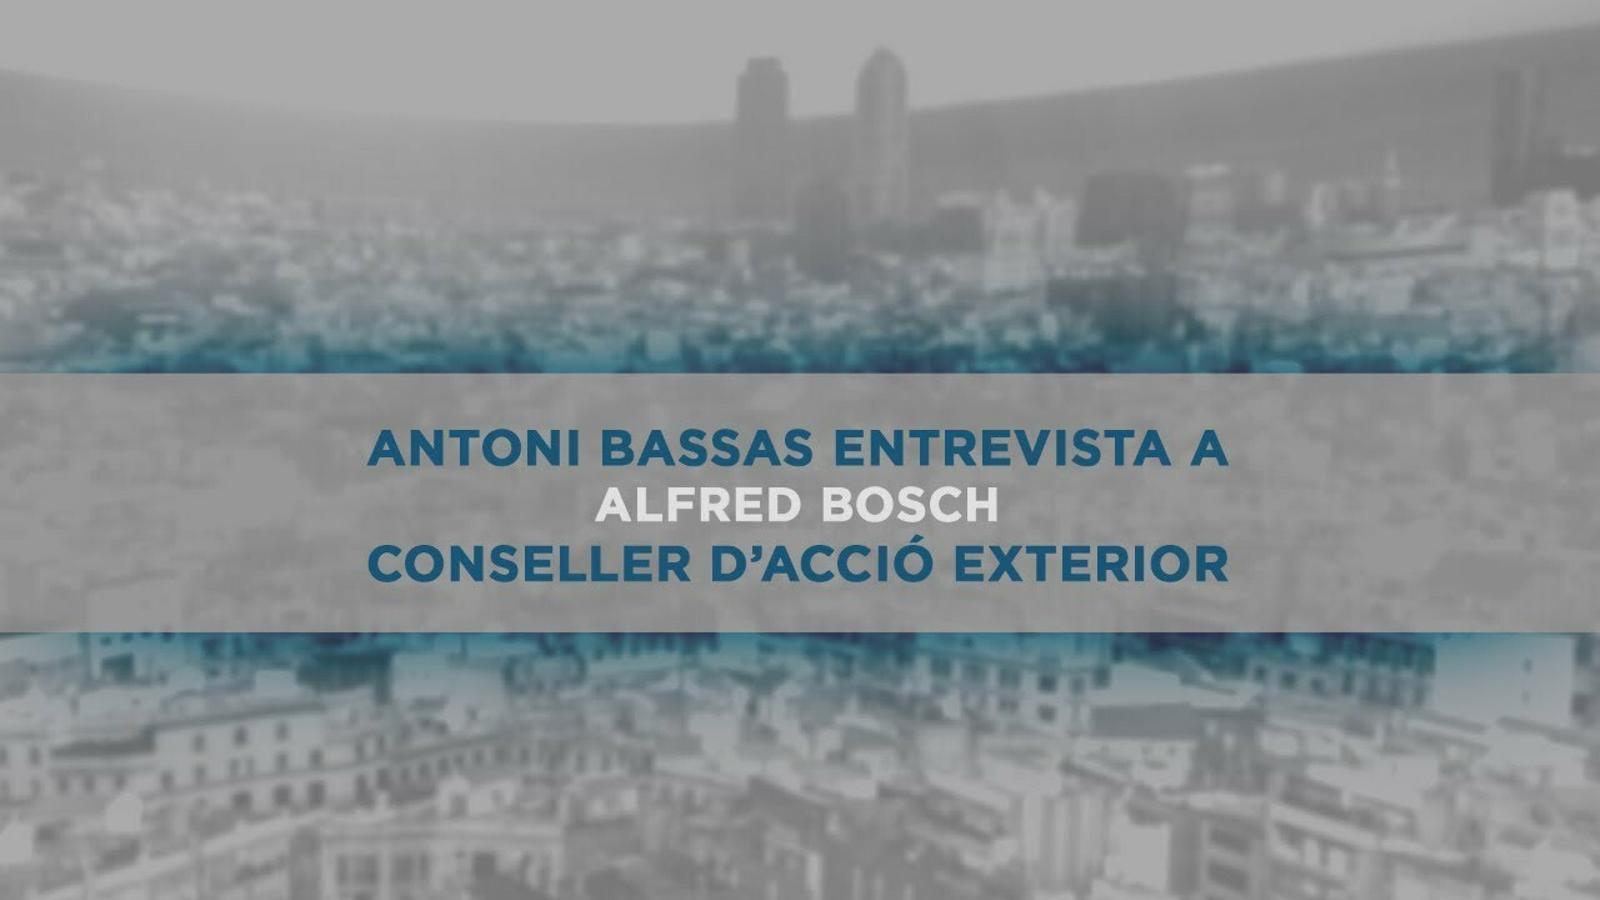 Entrevista d'Antoni Bassas a Alfred Bosch